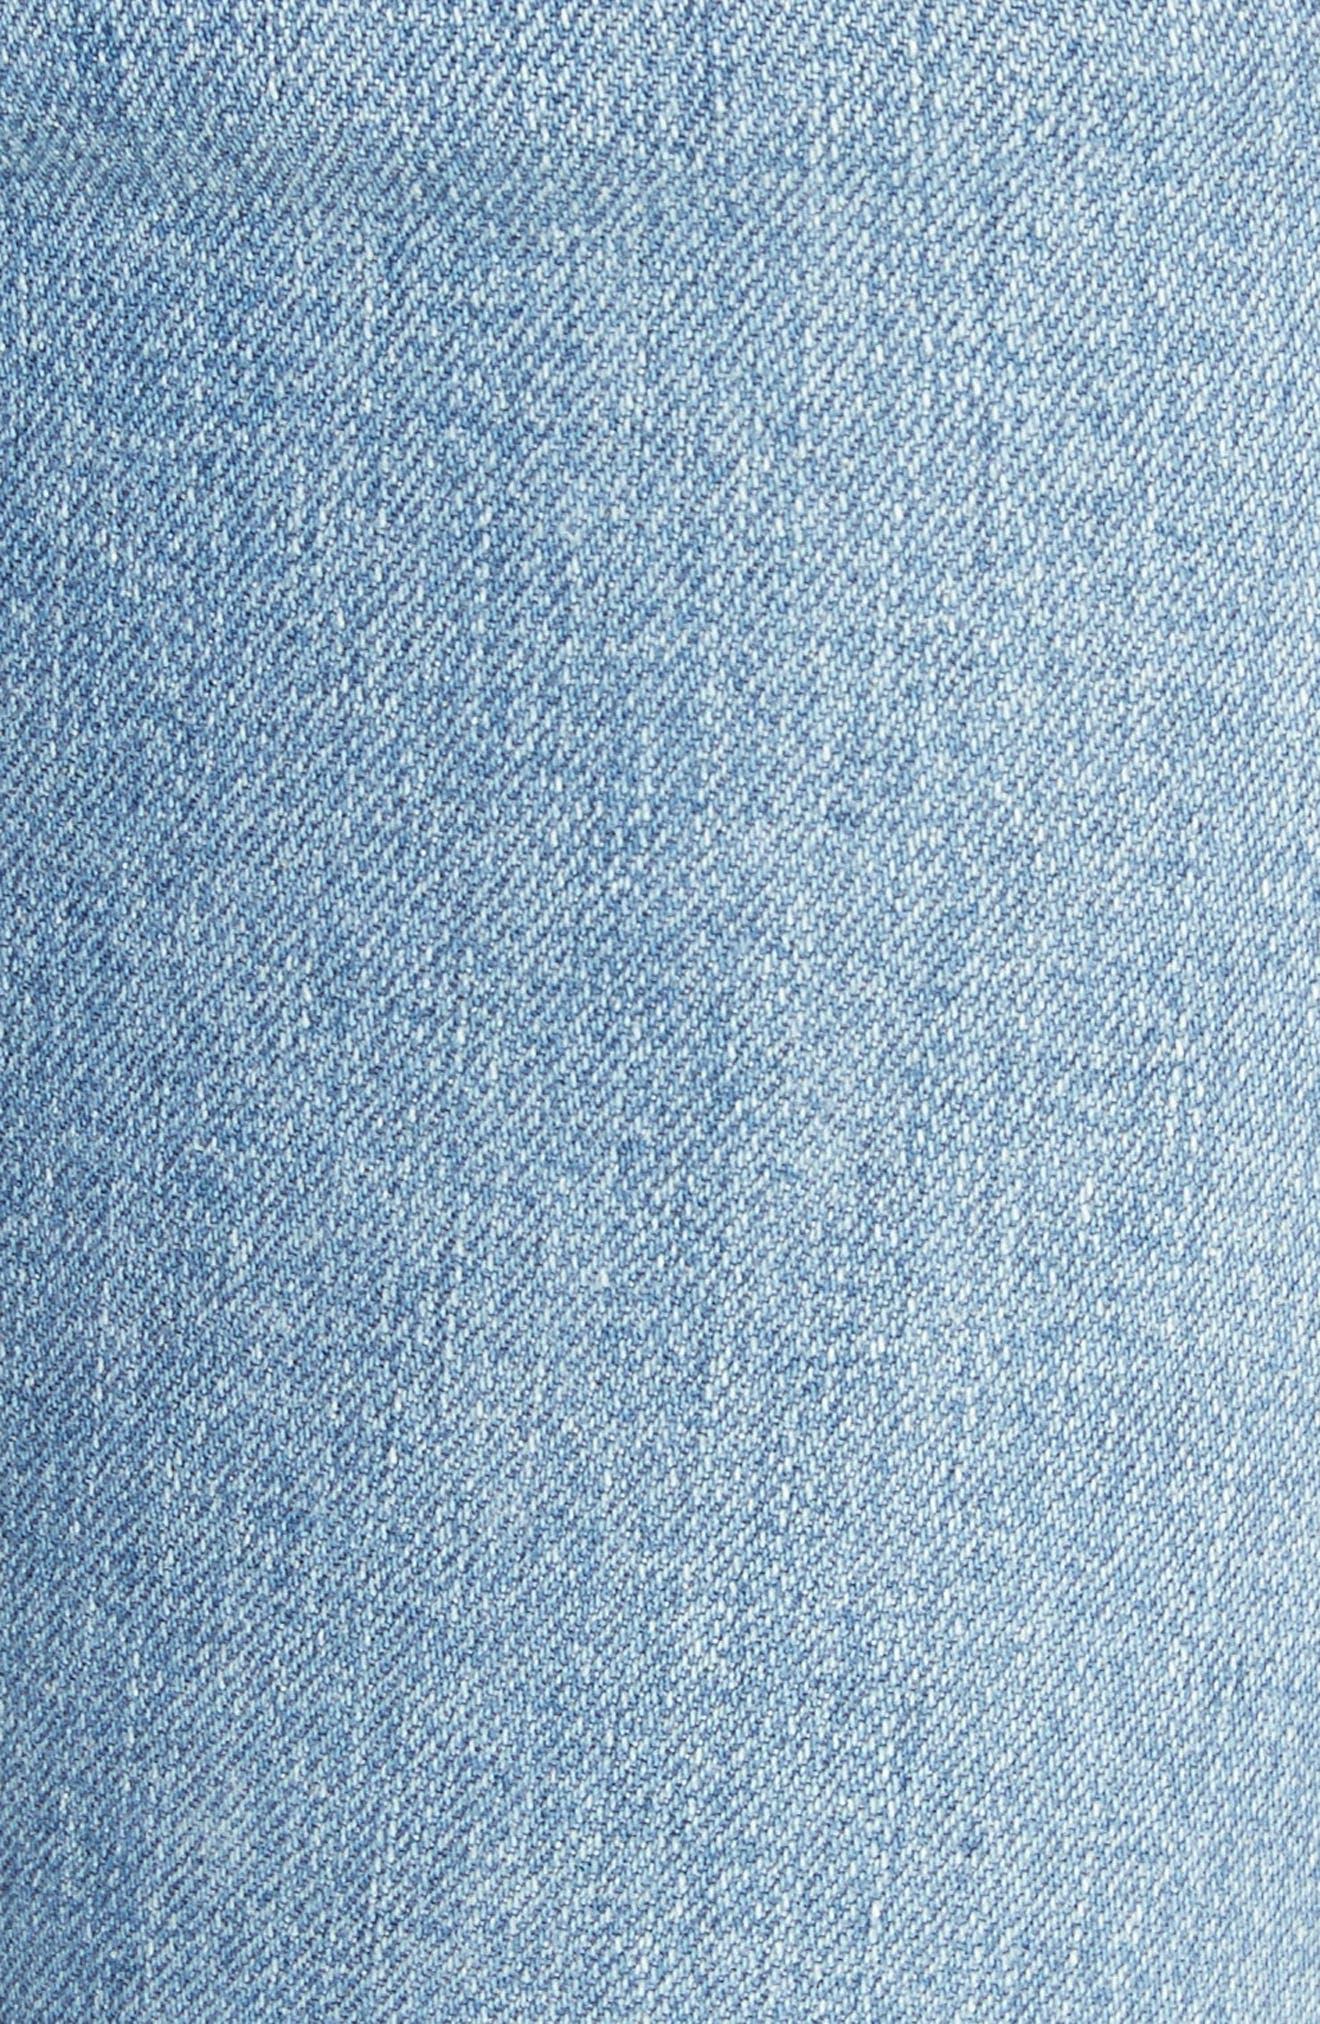 Lowry Split Hem Jeans,                             Alternate thumbnail 5, color,                             400